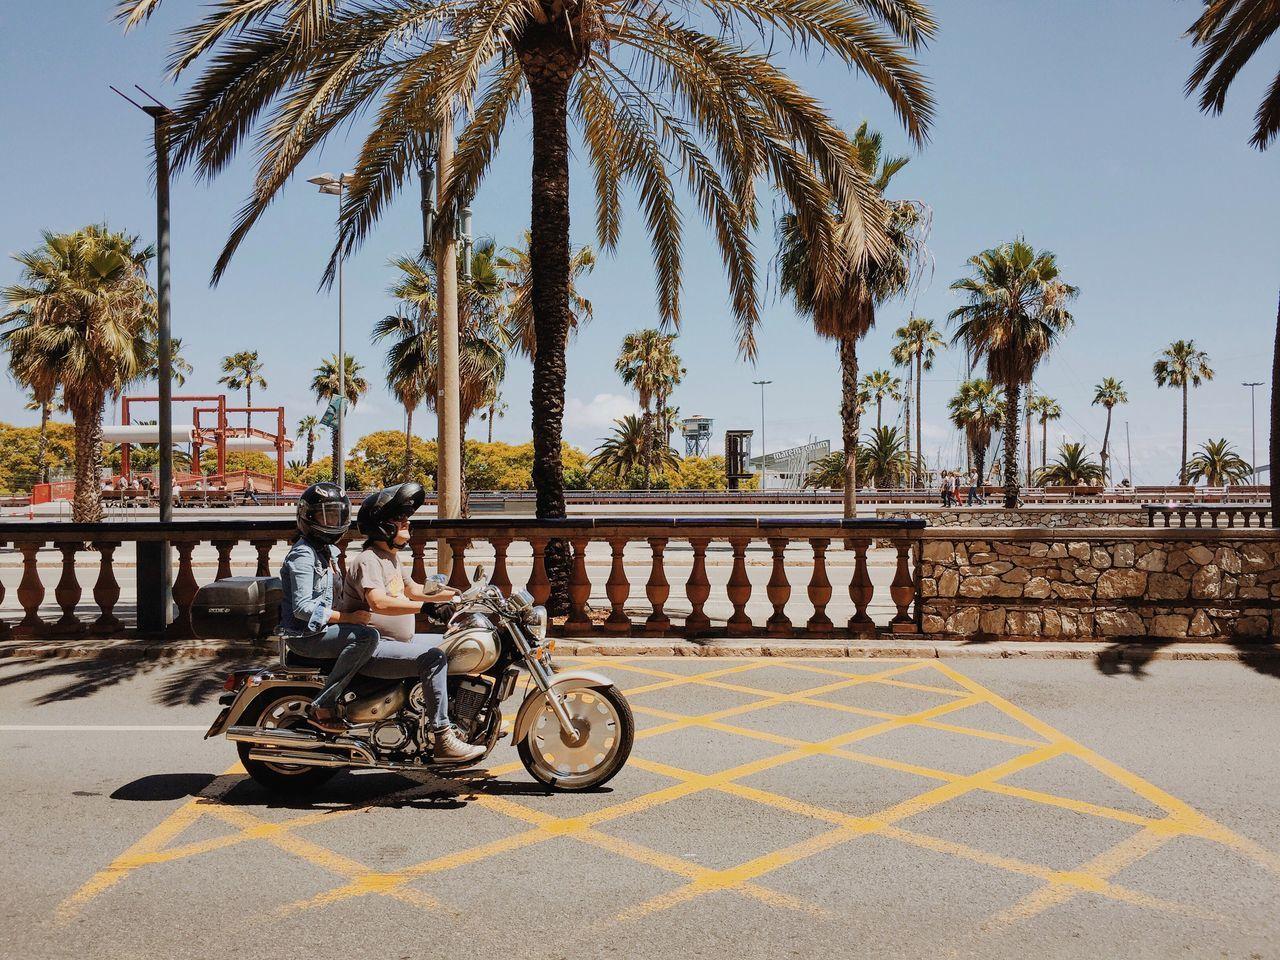 Joy ride. Enjoying Life Traveling Vscocam VSCO Wanderlust Biketour Motorcycles Cruising Palm Trees Sunshine Concrete Jungle